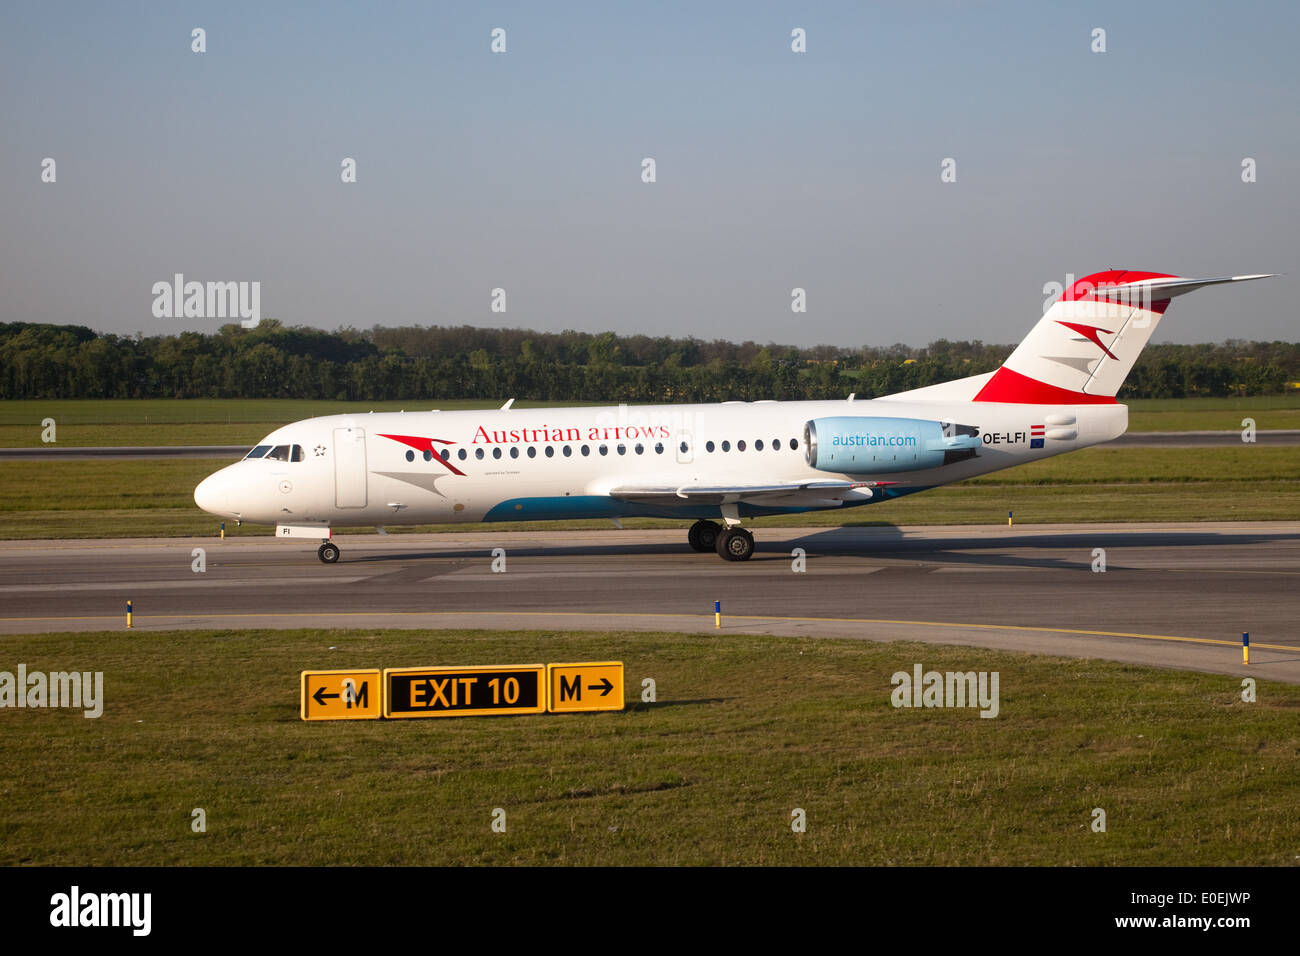 Flugzeug am Rollfeld - Airplane on runway - Stock Image